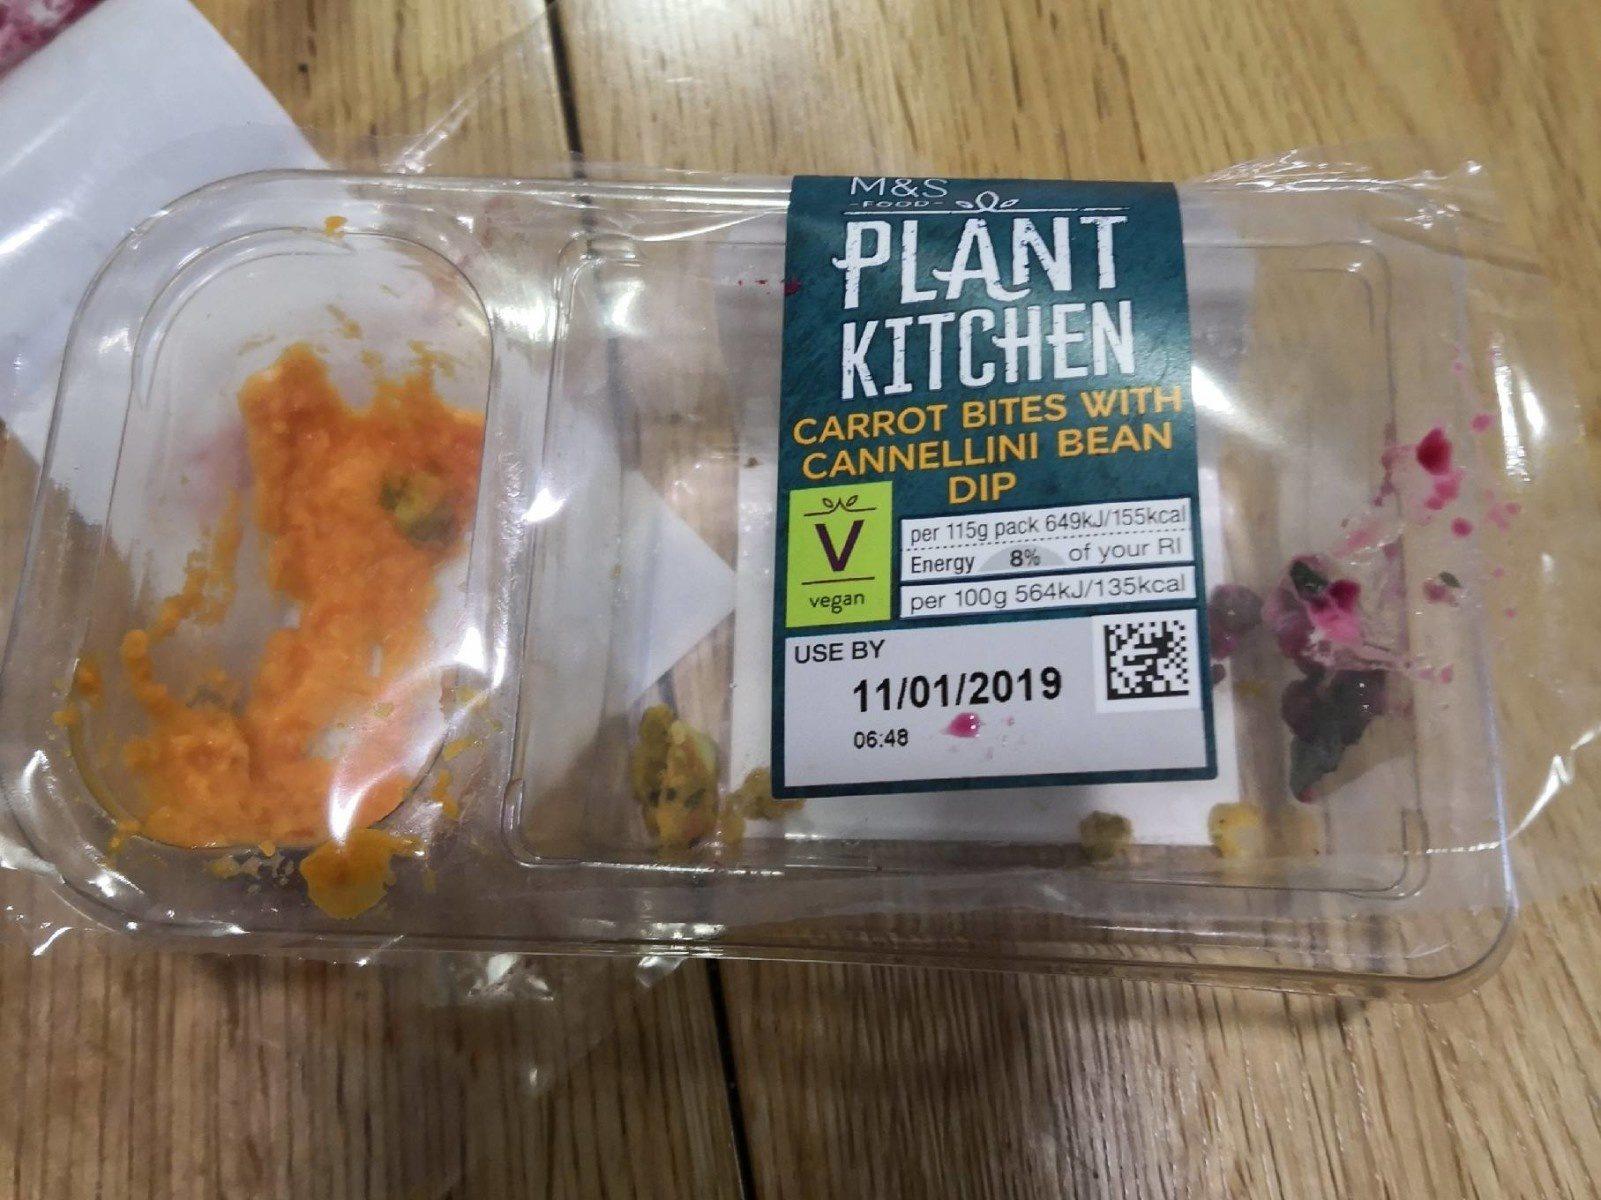 Plant kitchen : Carrot bites with cannelini bean dip - Produit - fr